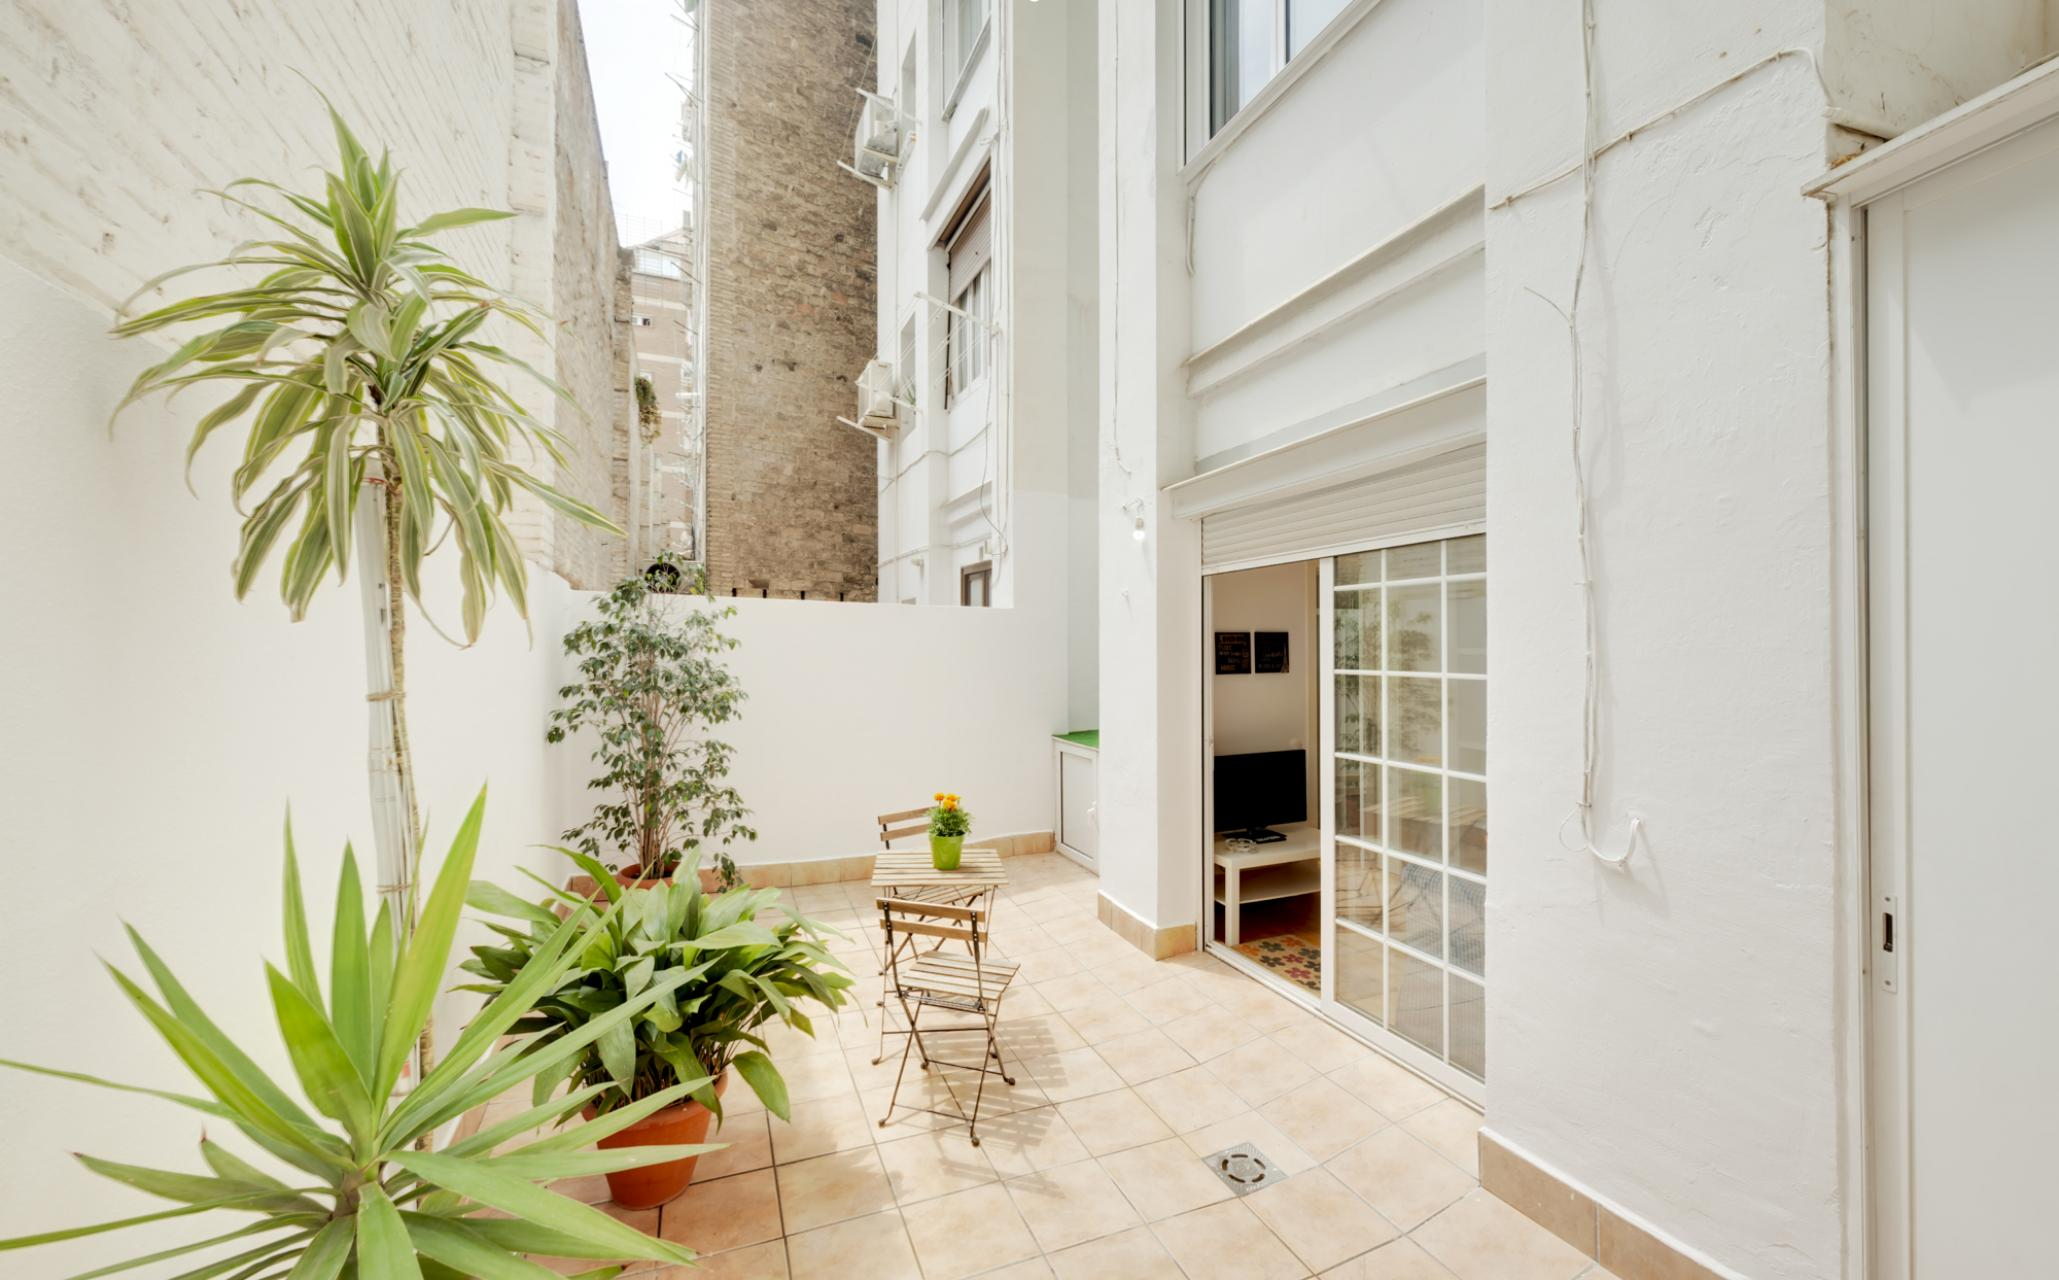 Shbarcelona appartement location mensuelle eixample for Location appartement design barcelone